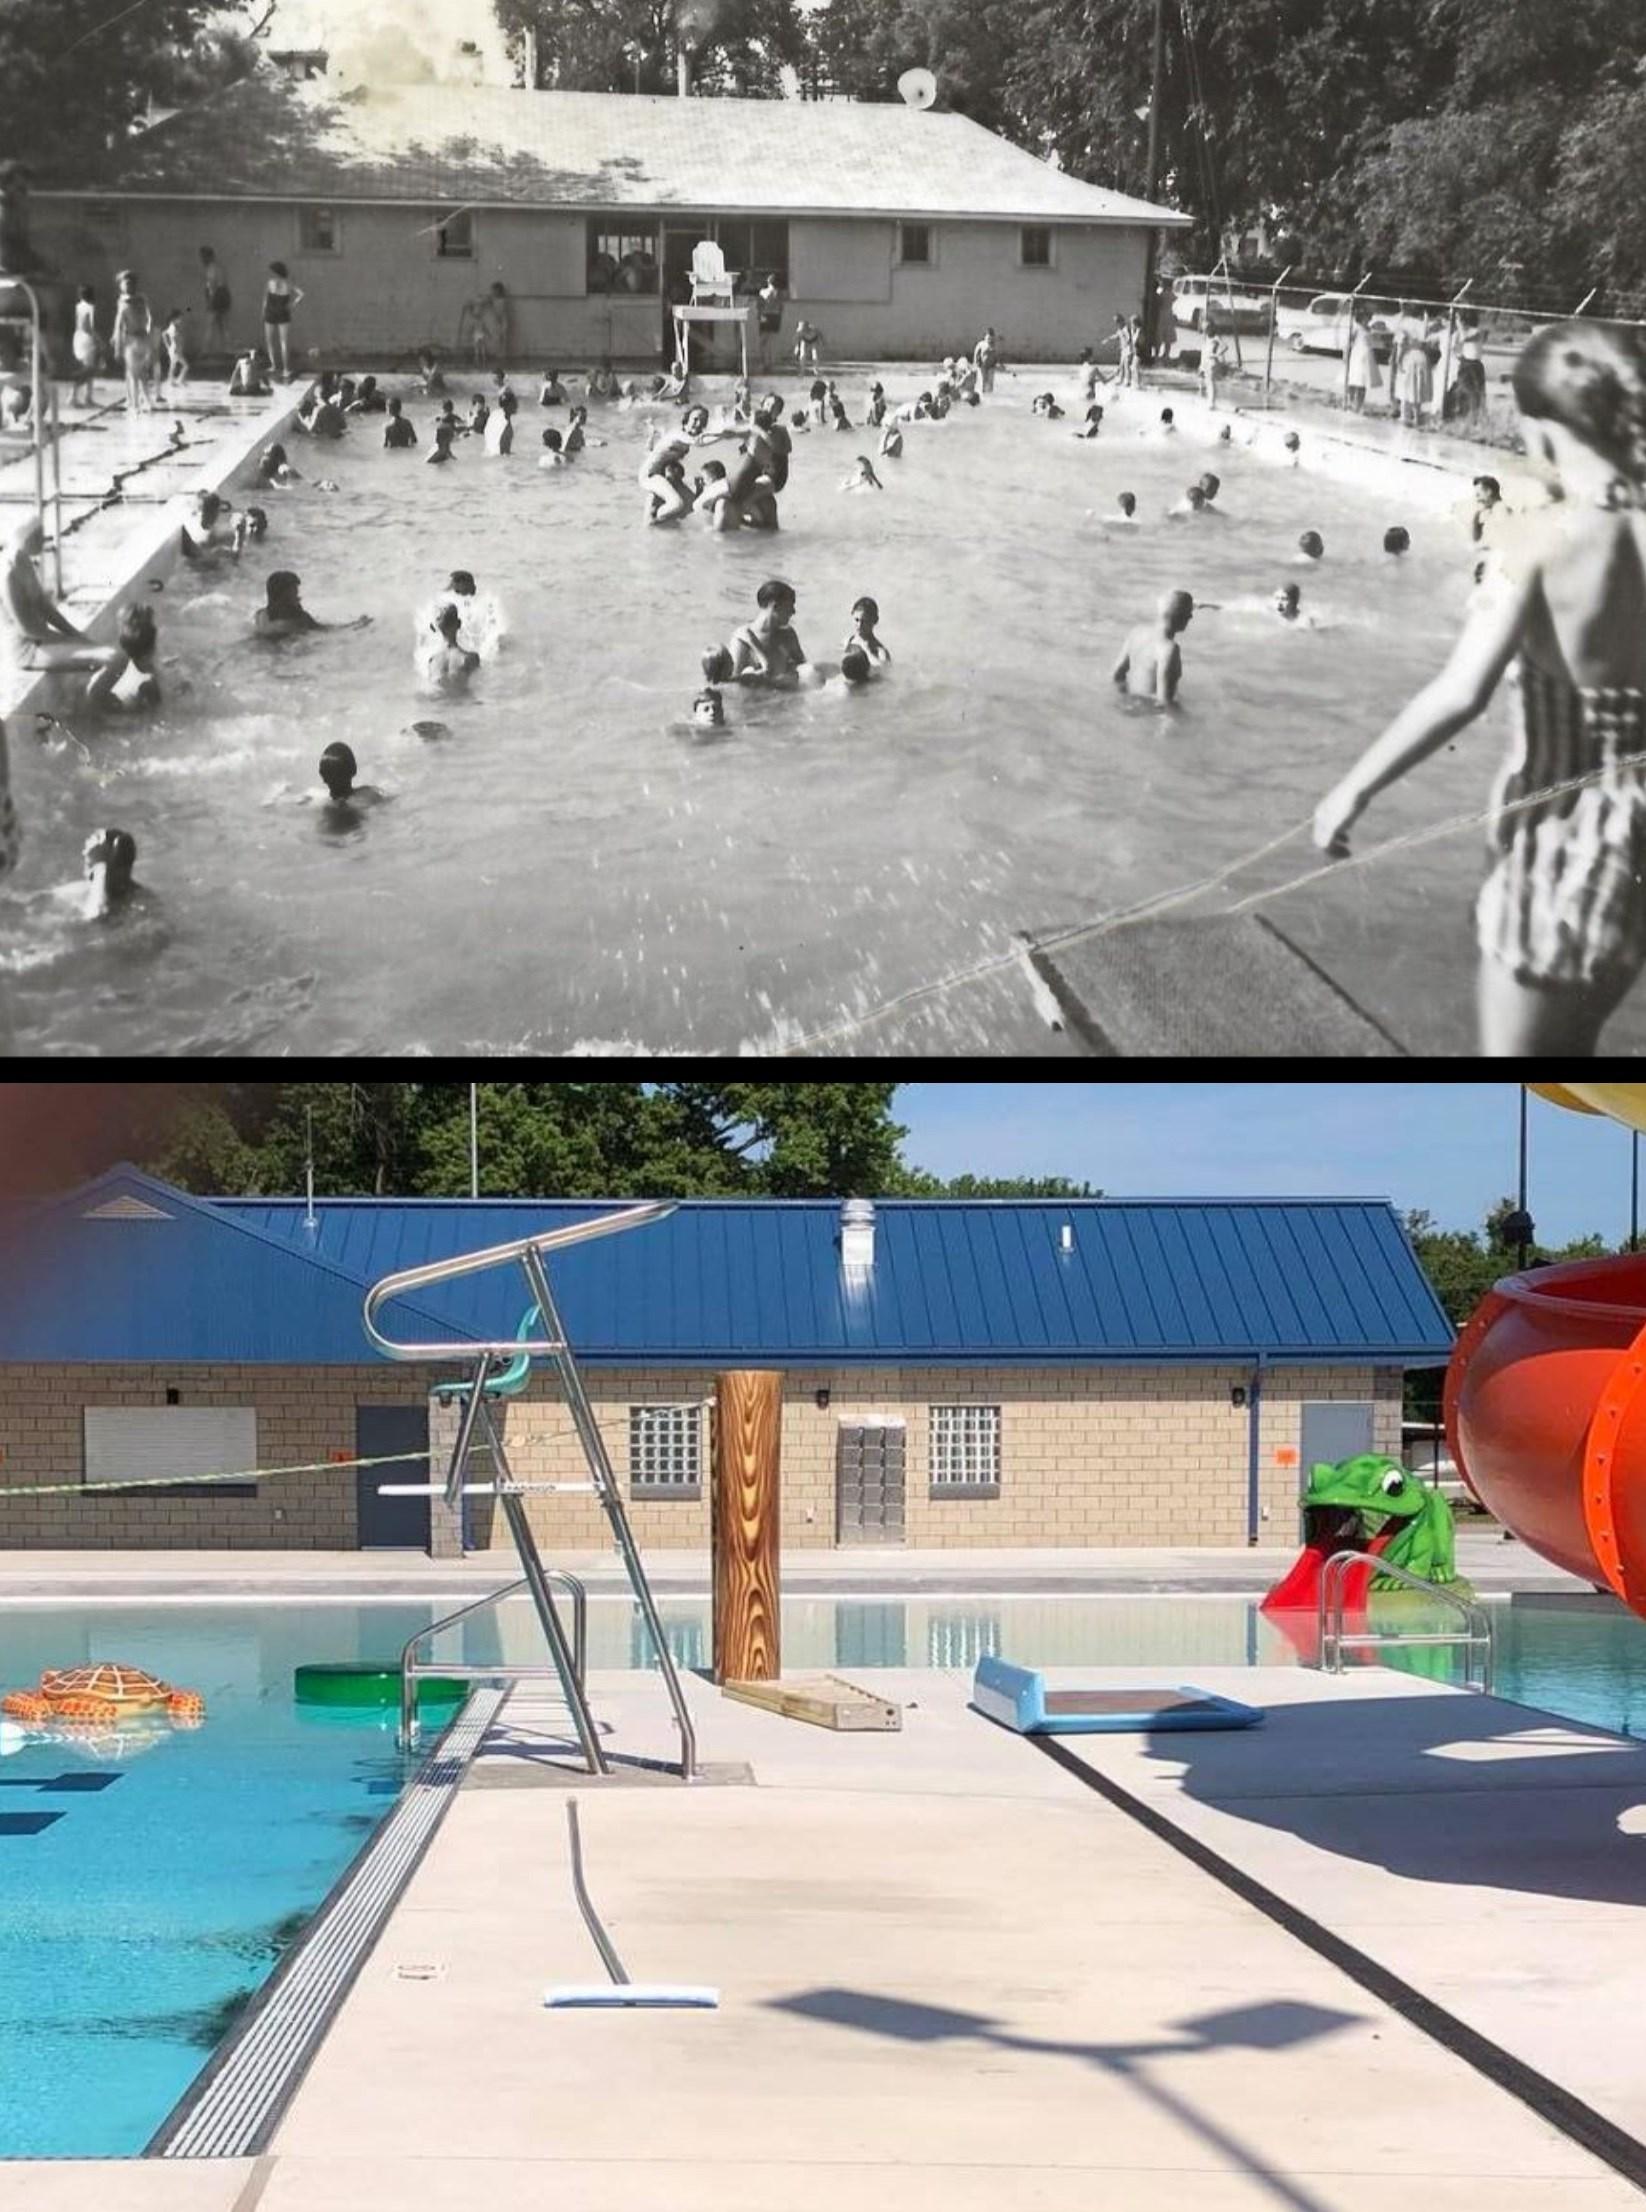 Splash down set for new Tecumseh pool